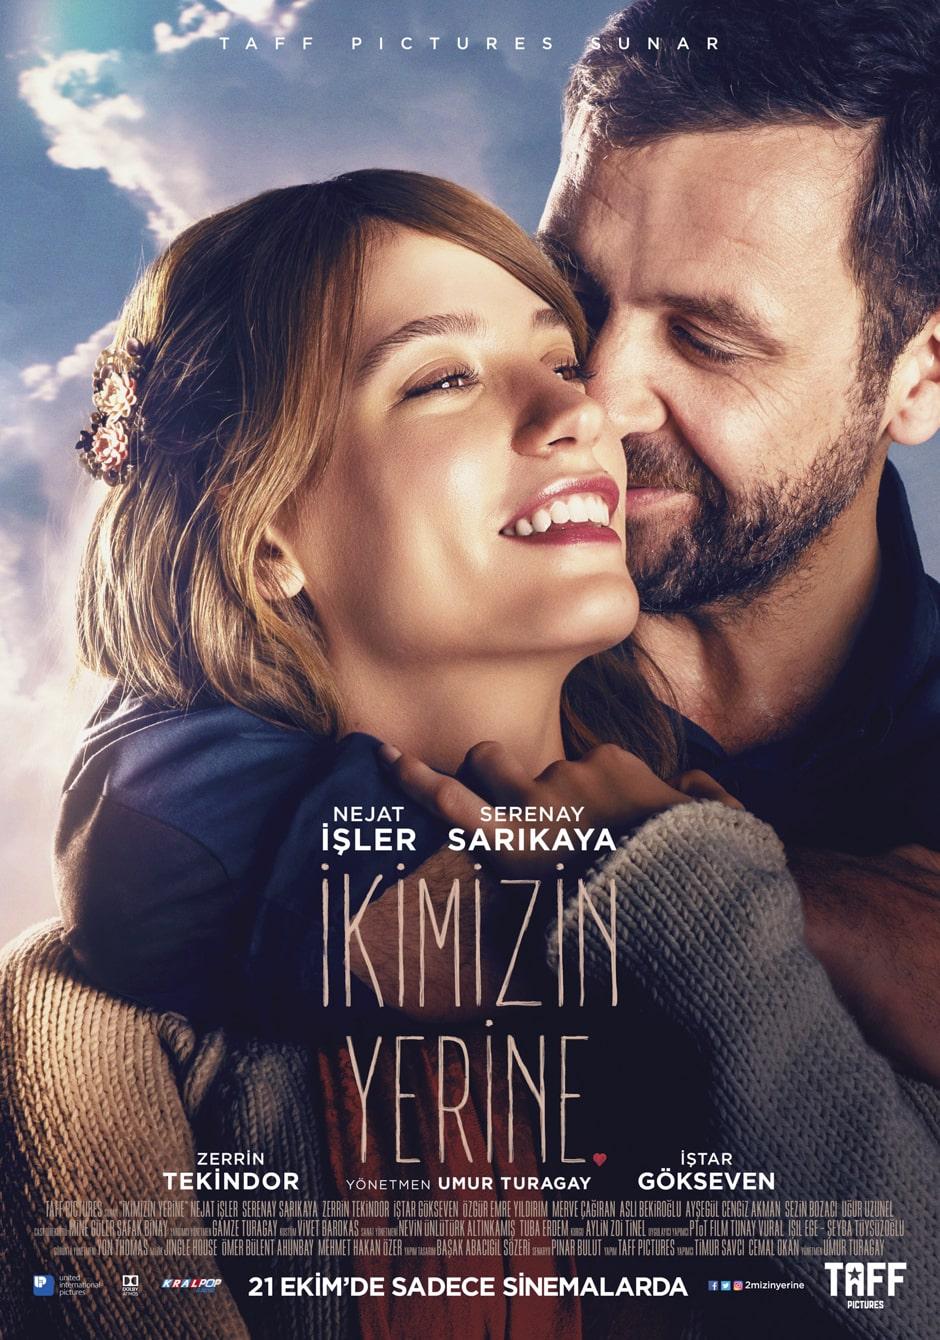 Ikimizin_Yerine_Poster Copy 2-min